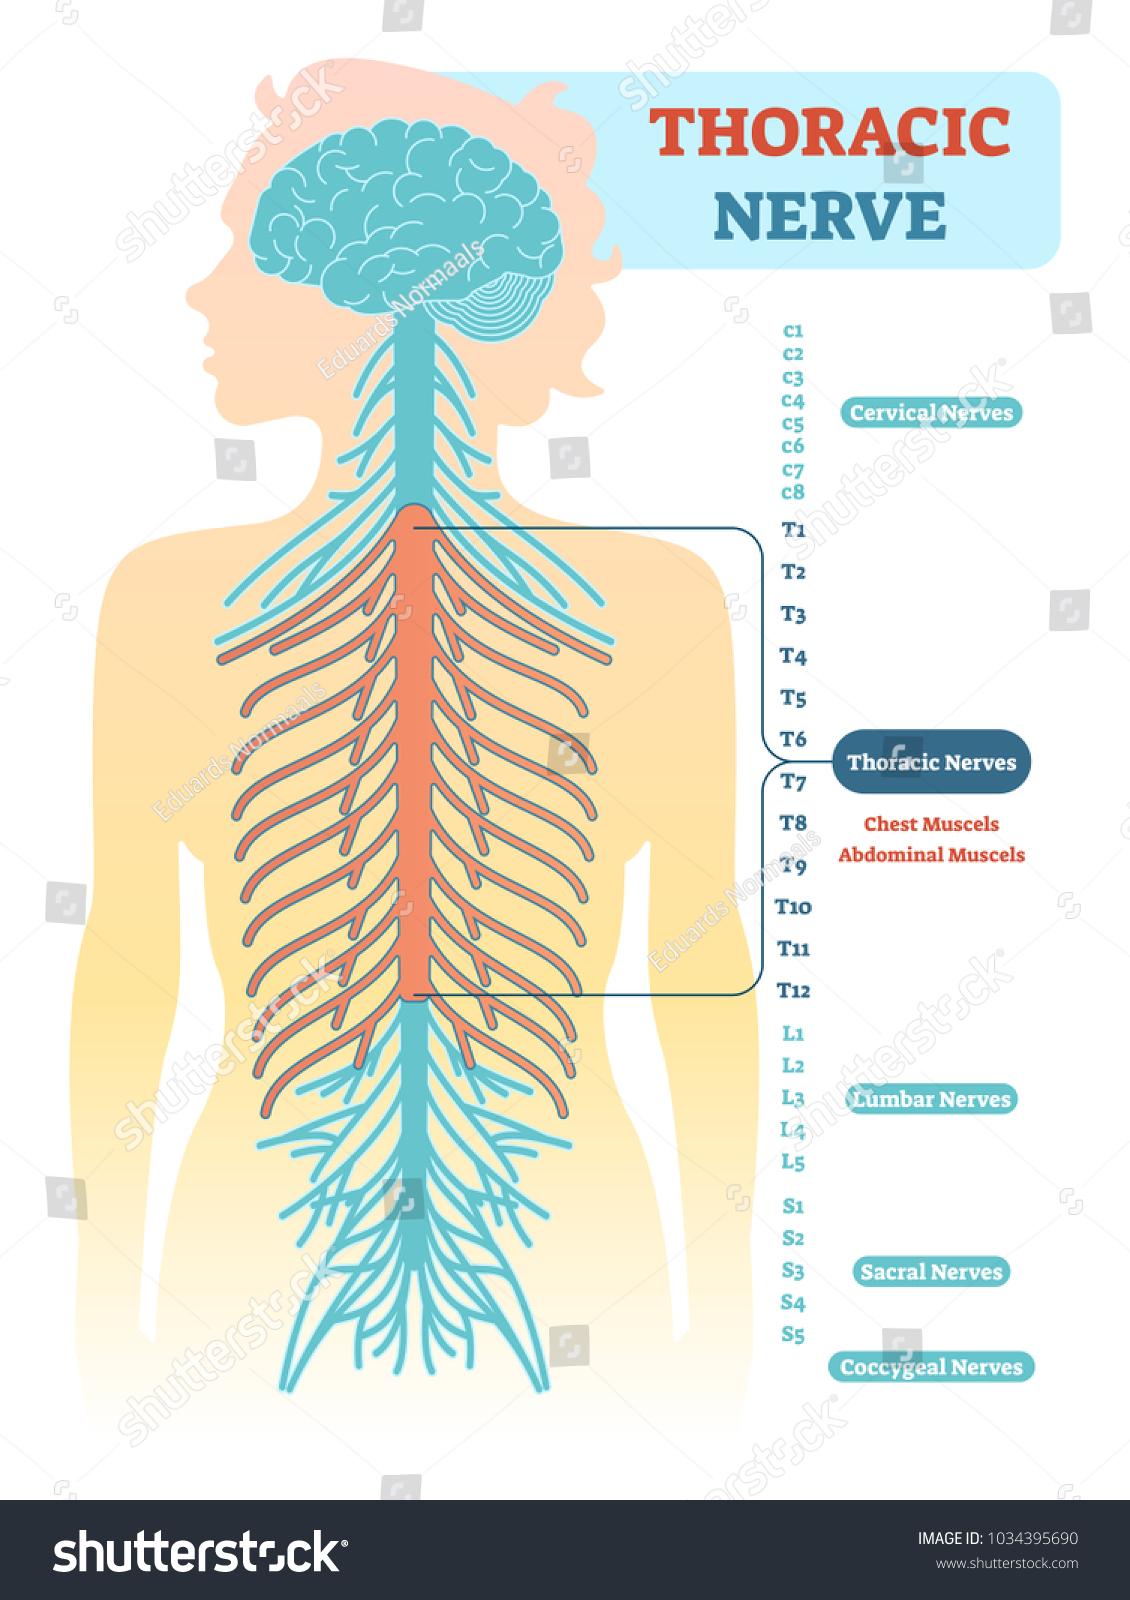 Thoracic Nerve Anatomical Diagram Medical Scheme Stock Vector